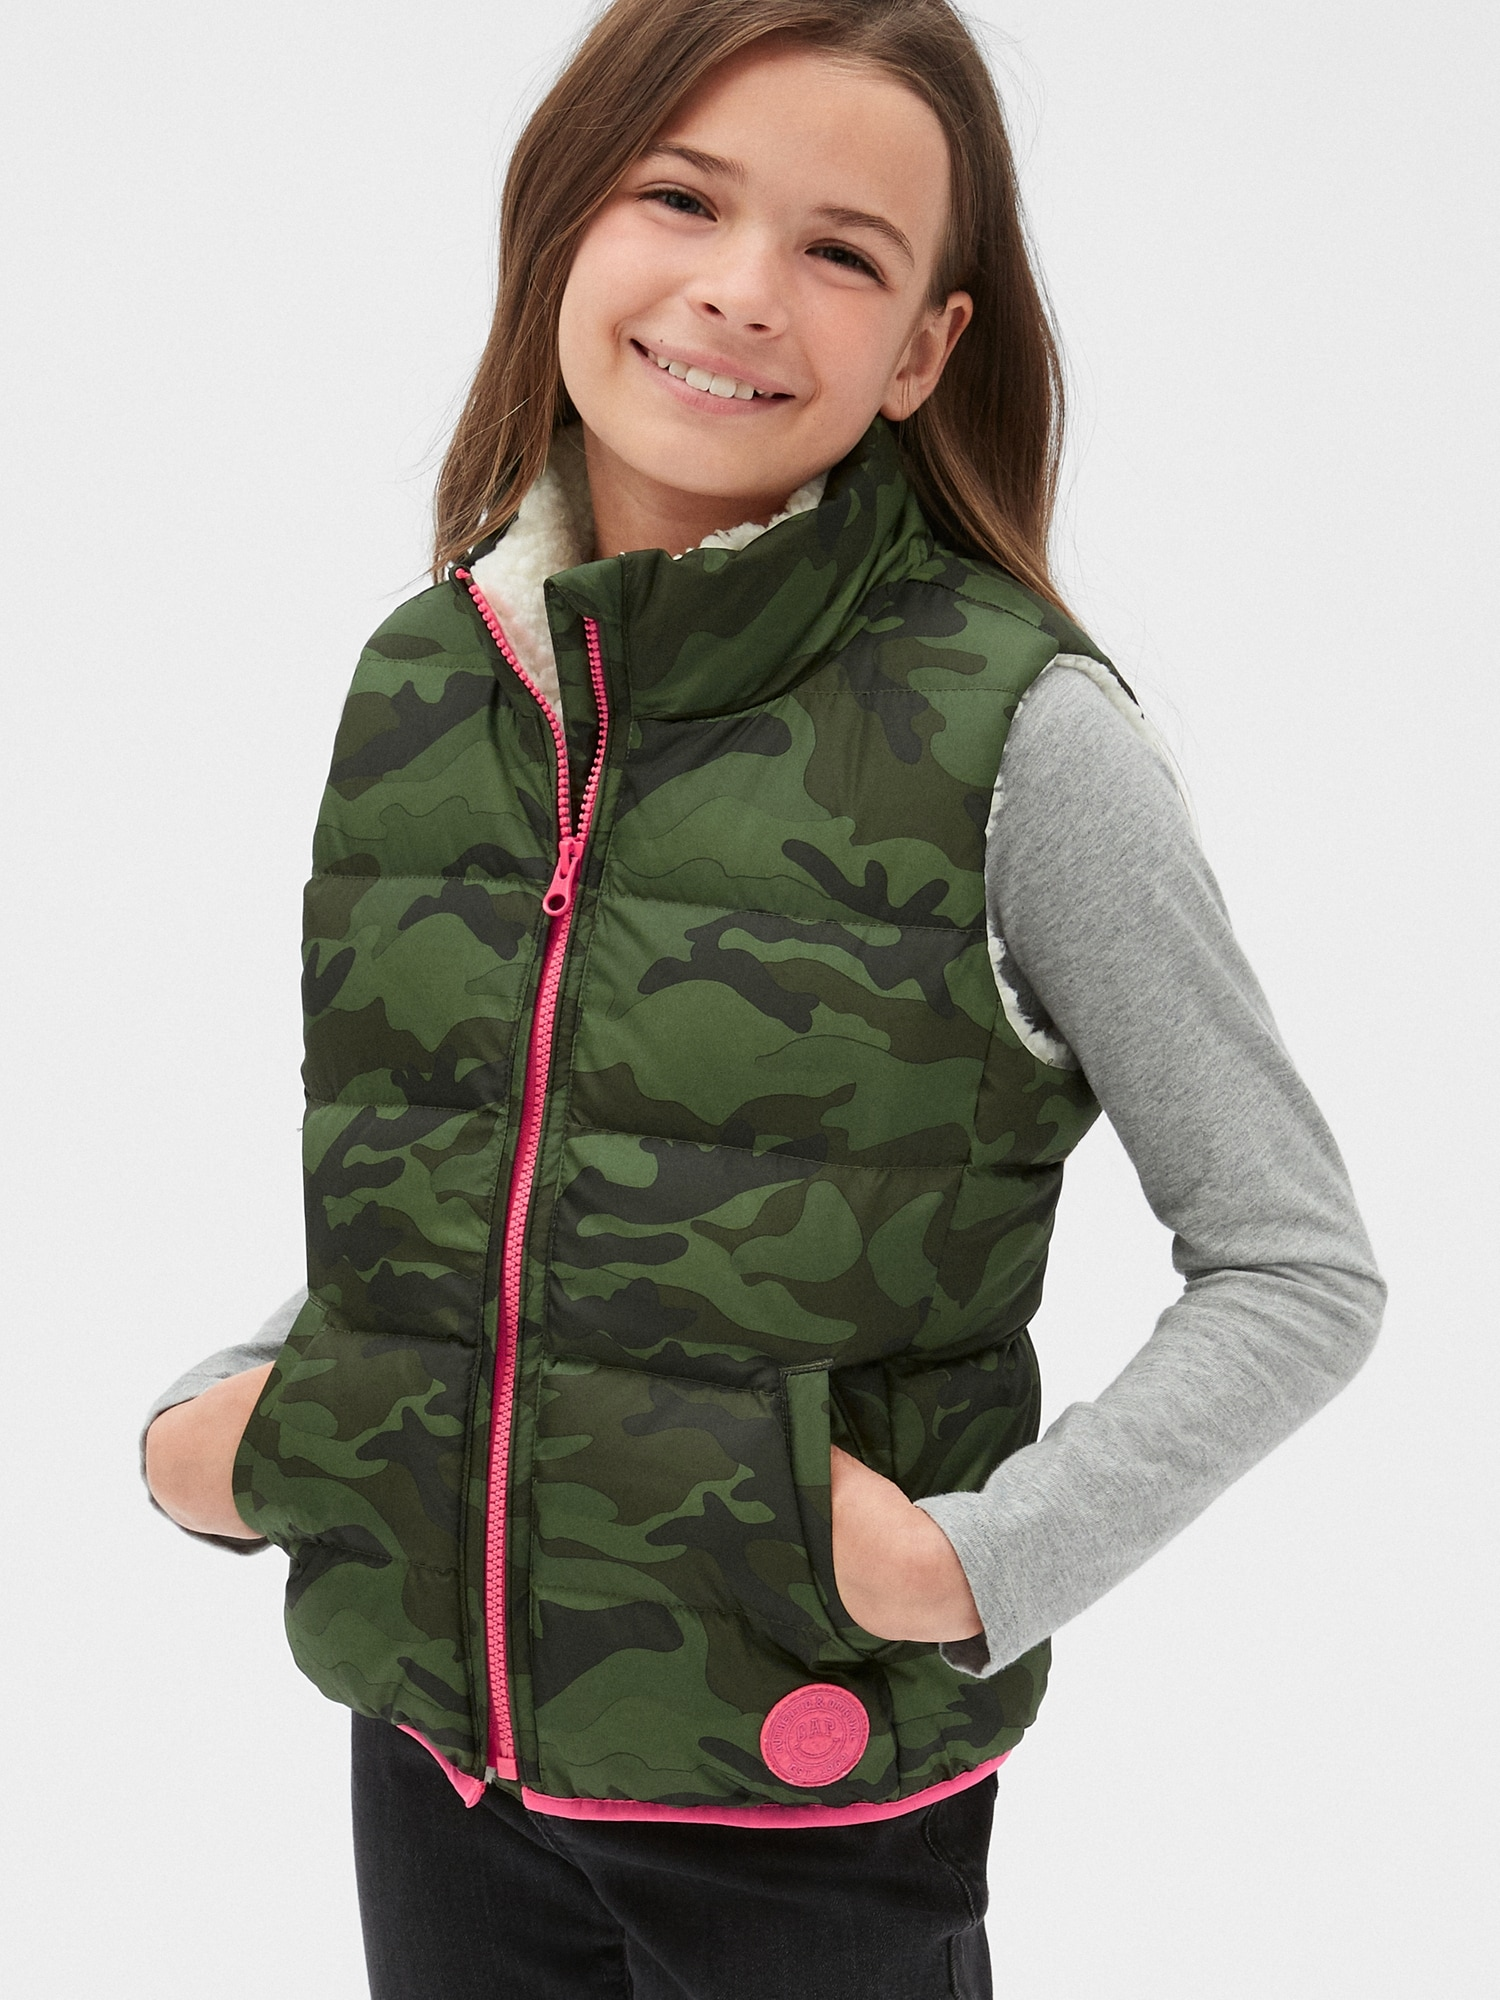 Kids Cold Control Ultra Max Down Vest | Gap